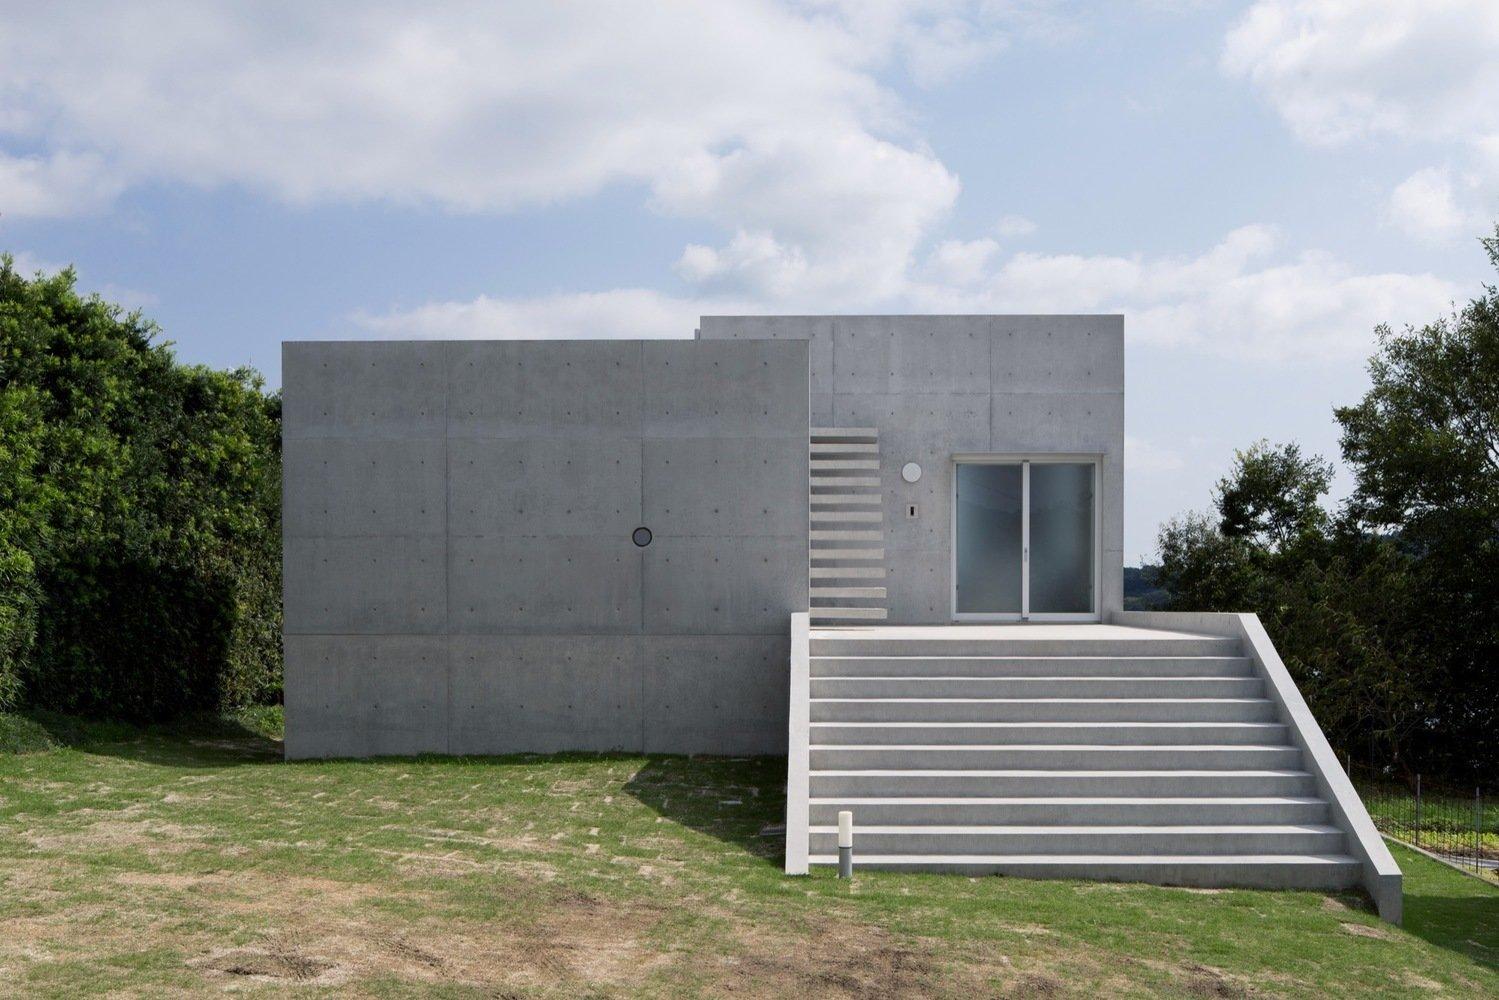 Photo 1 of 6 in House in Akitsu by Kazunori Fujimoto Architect & Associates